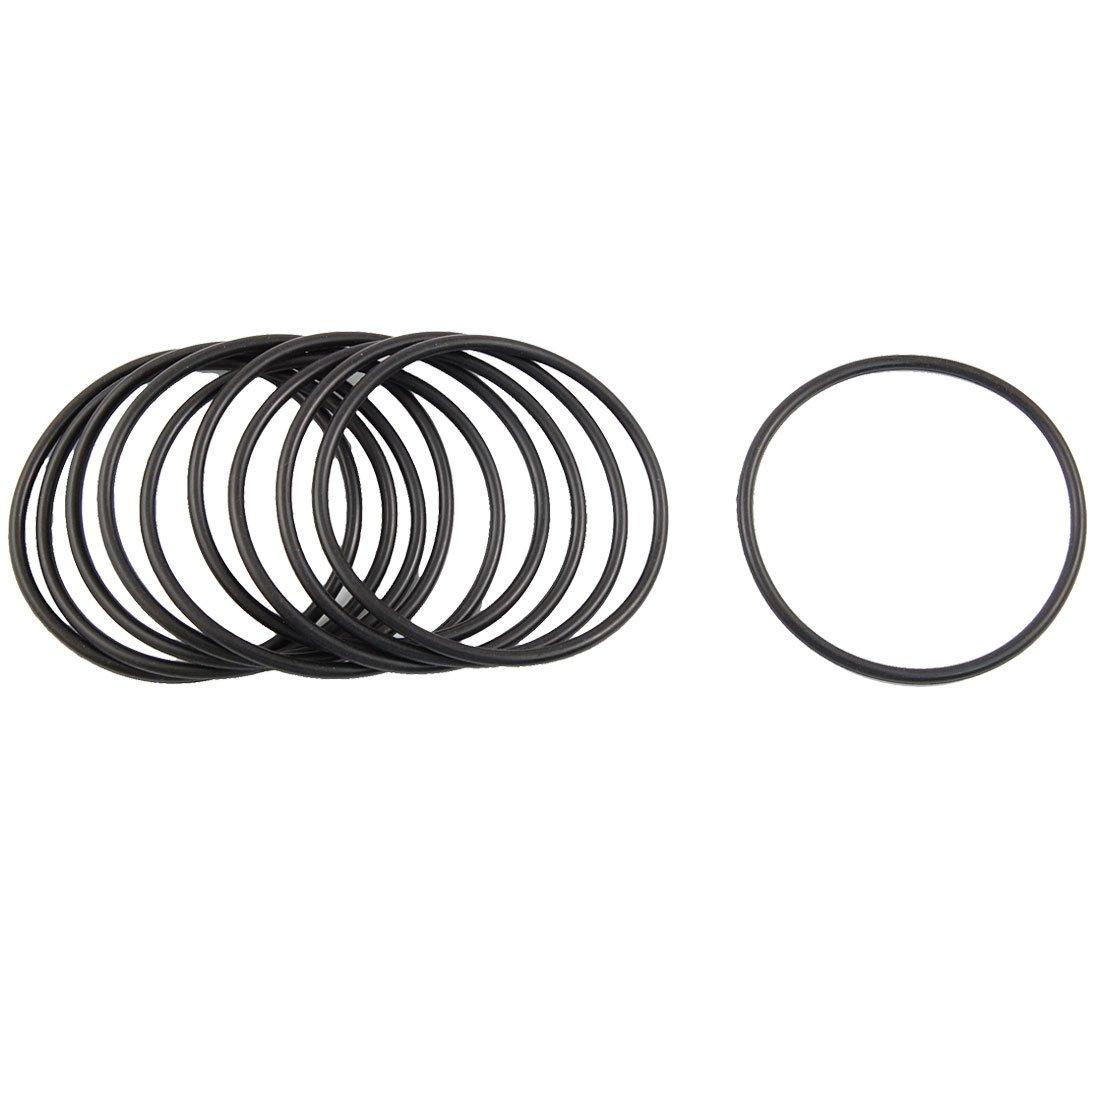 10/St/ück schwarz Nitrilkautschuk O Ring /Ösen Seal 68/mm x 75/mm x 3,5/mm